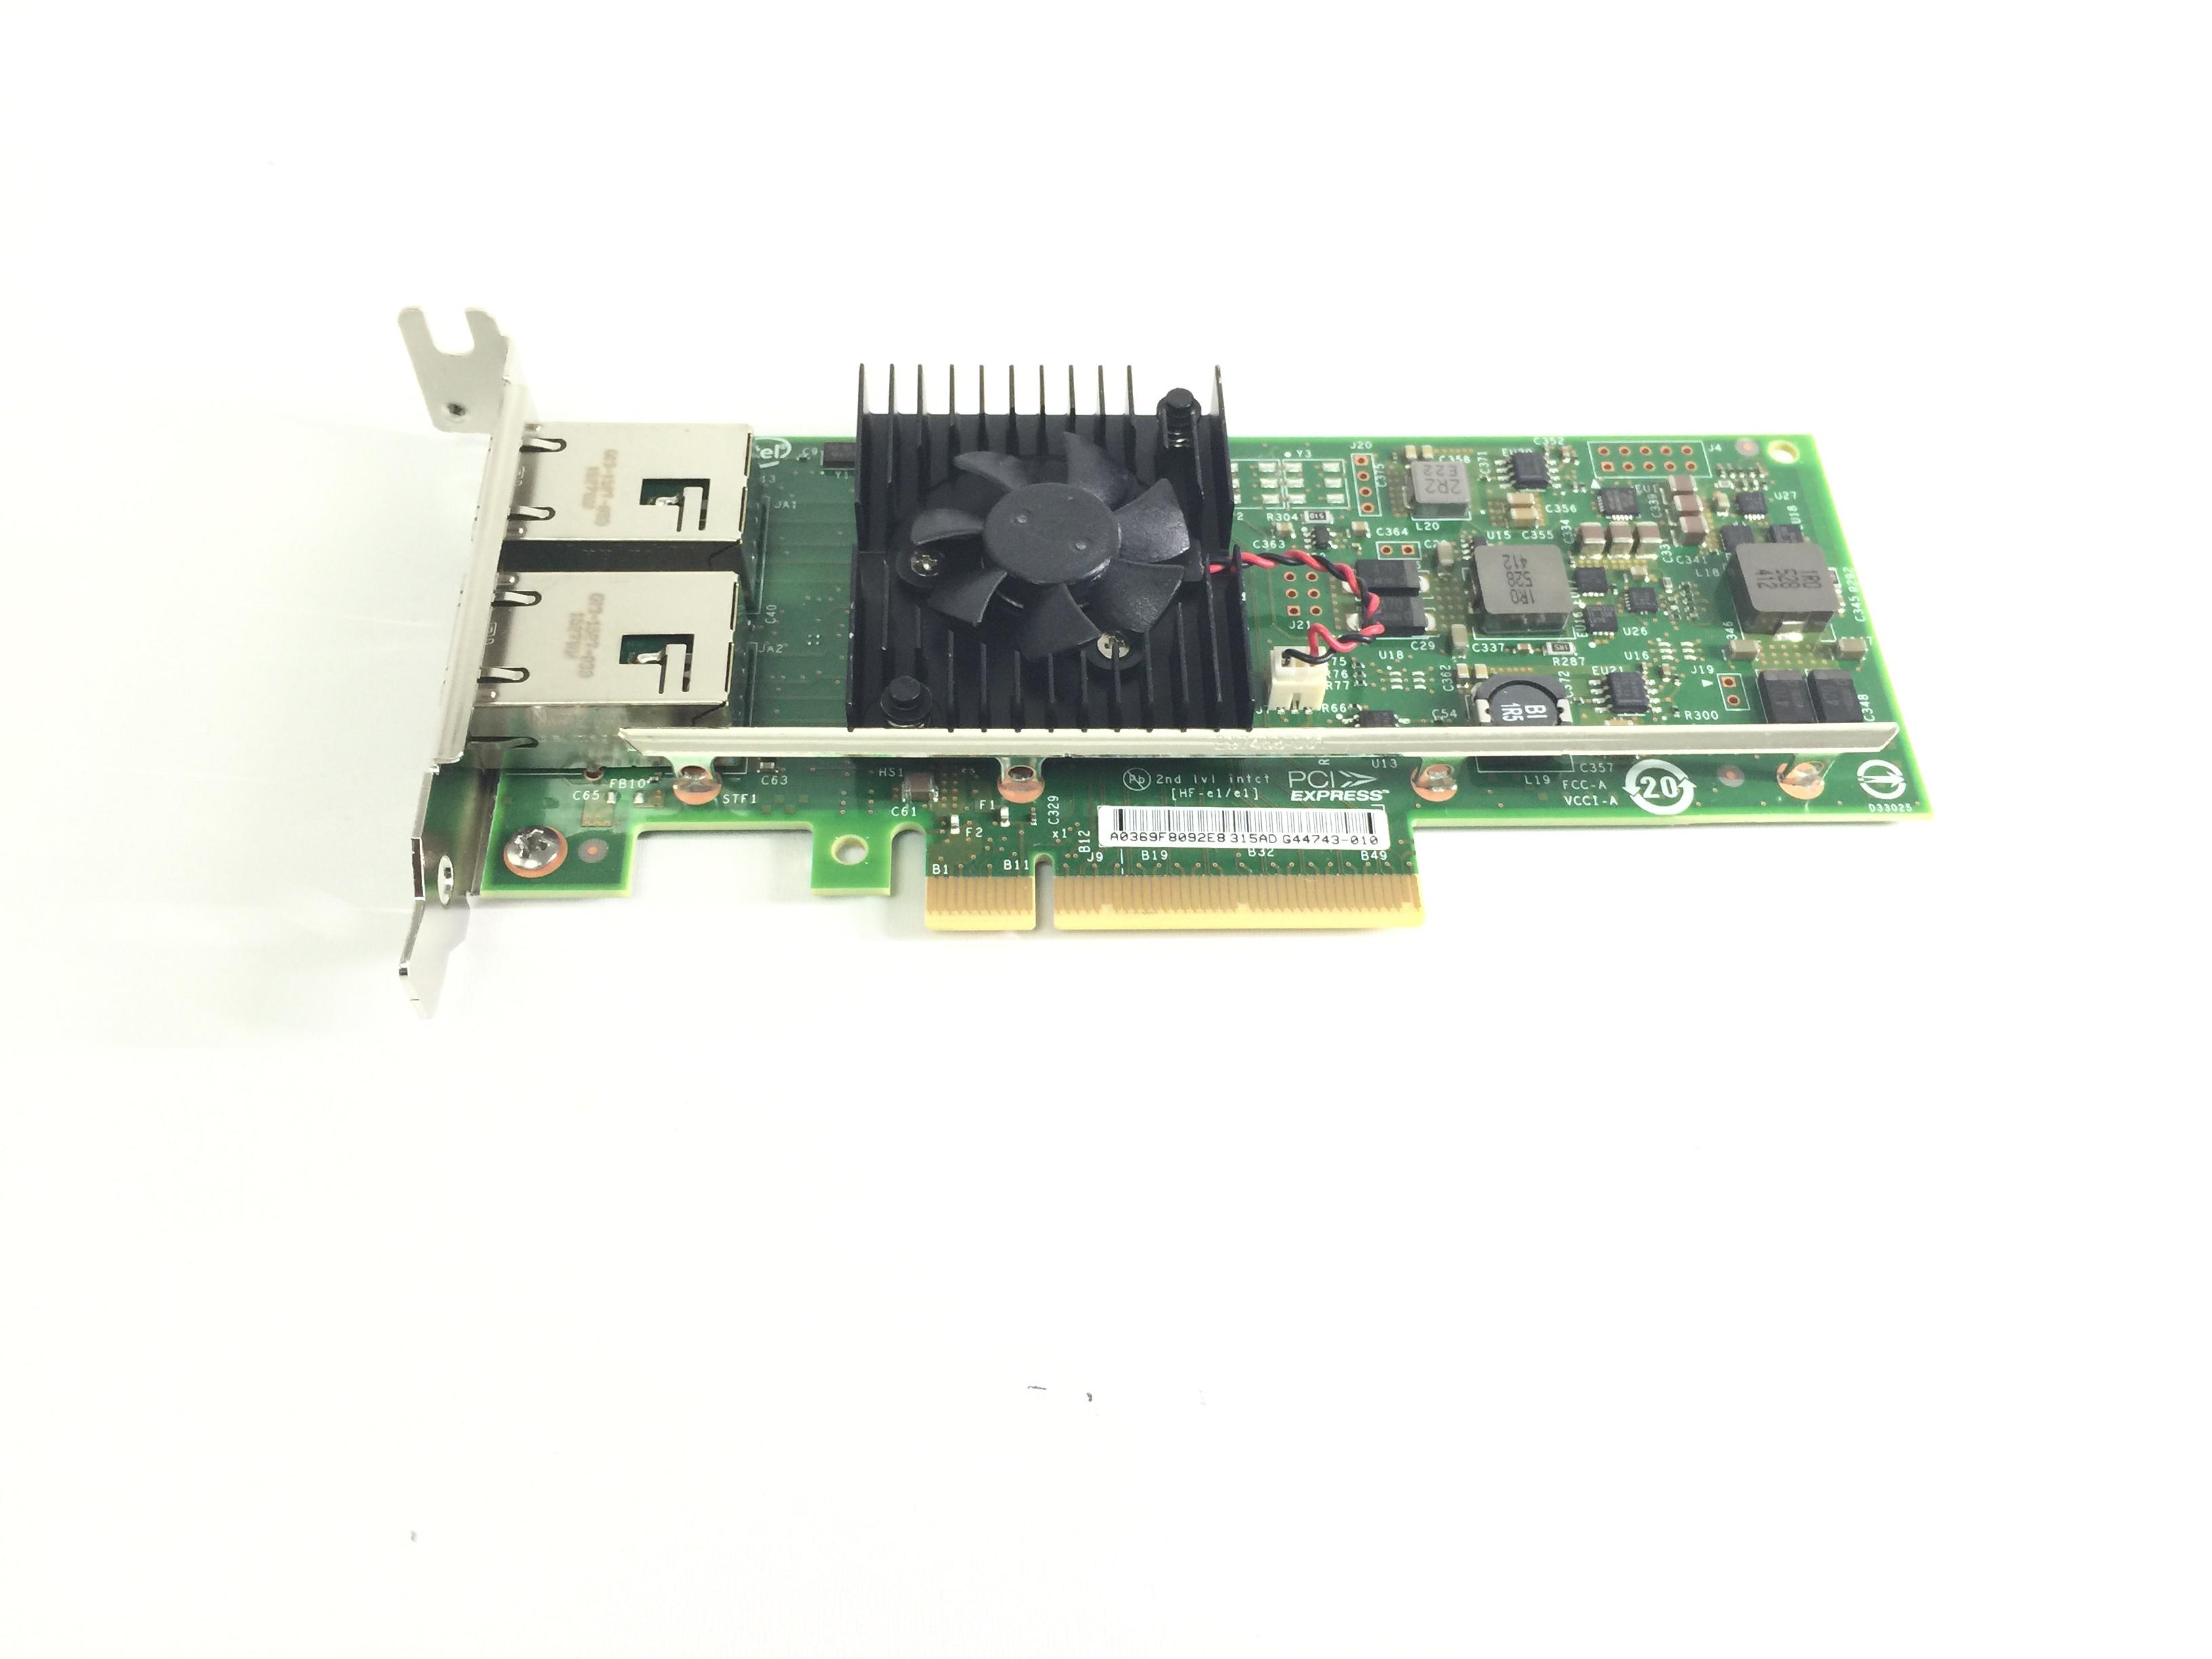 Dell Intel X540-T2 Dual Port 2x 10GbE RJ-45 PCIe NIC Network Adapter (3DFV8)